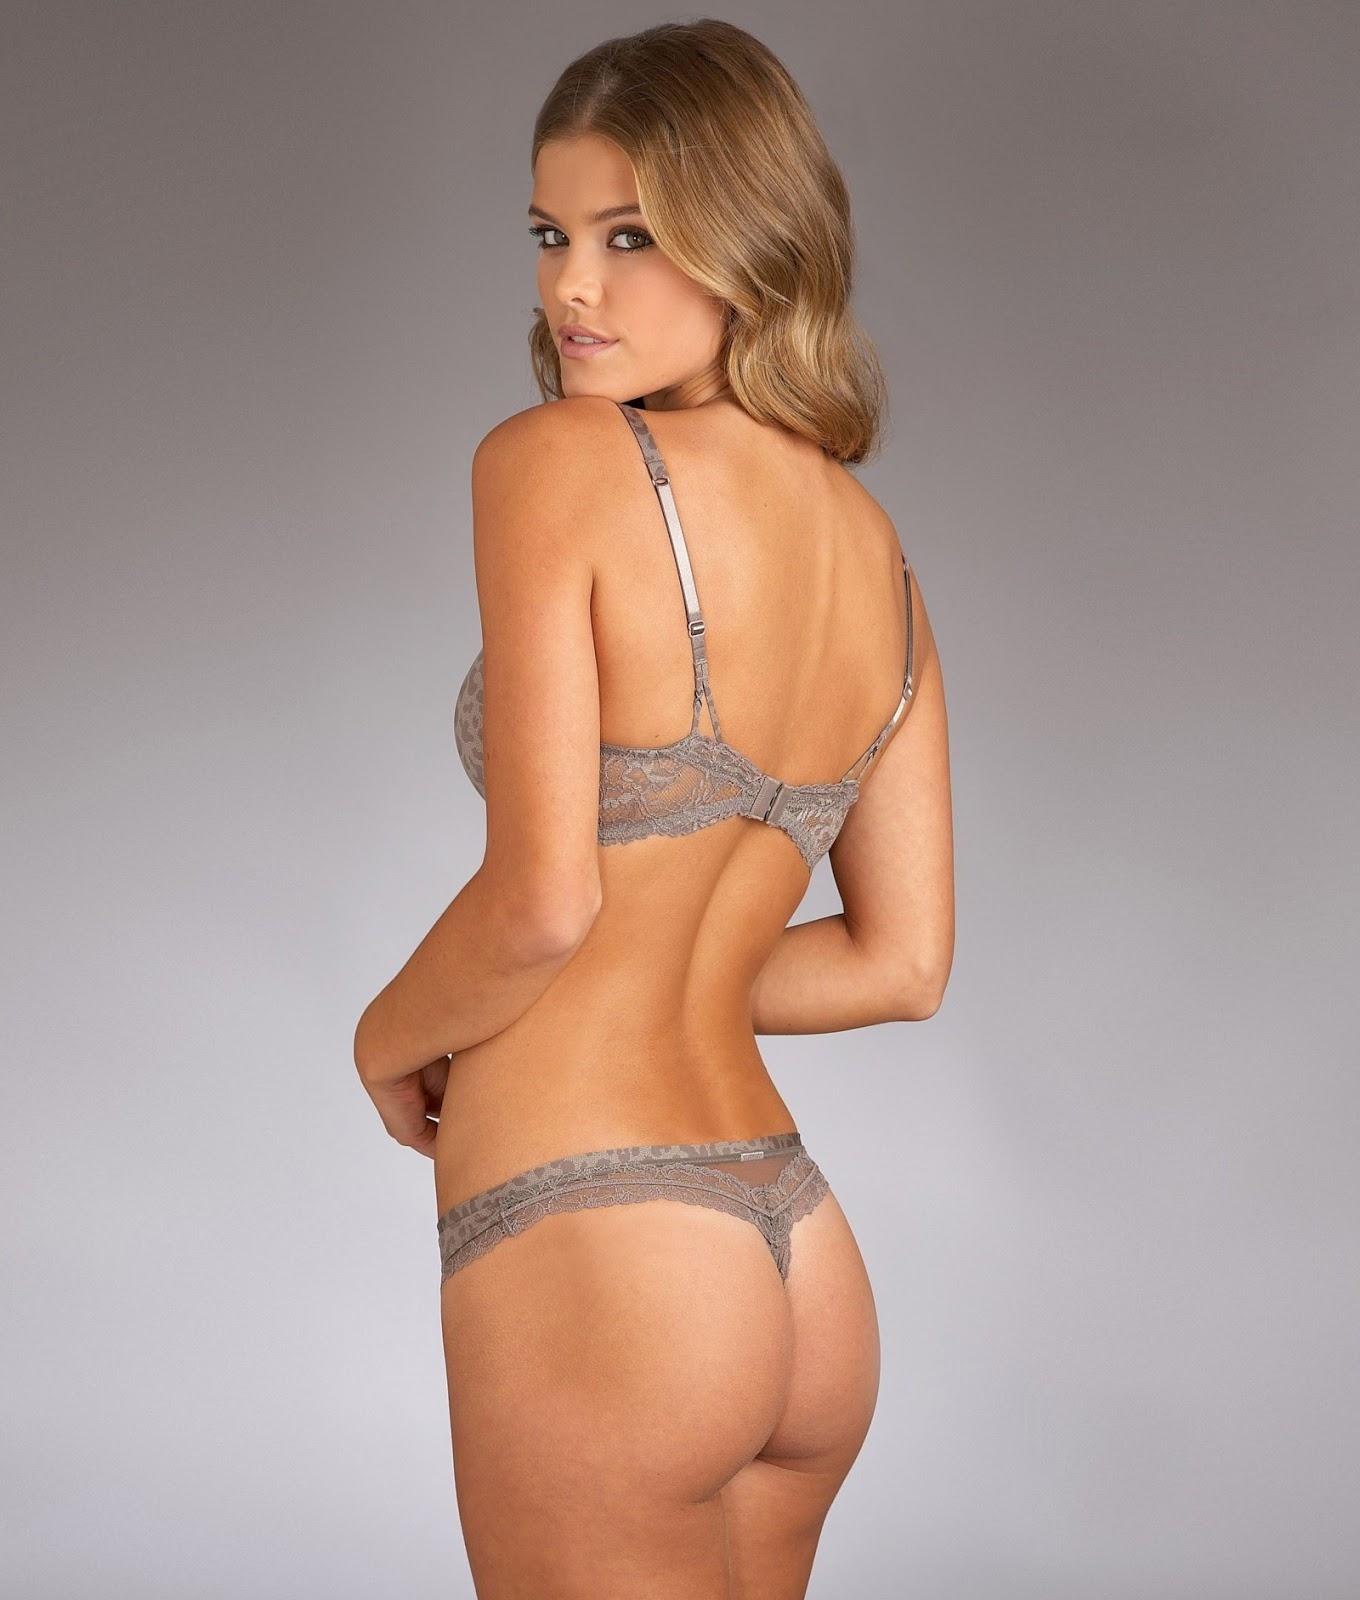 Nina Agdal nude pussy